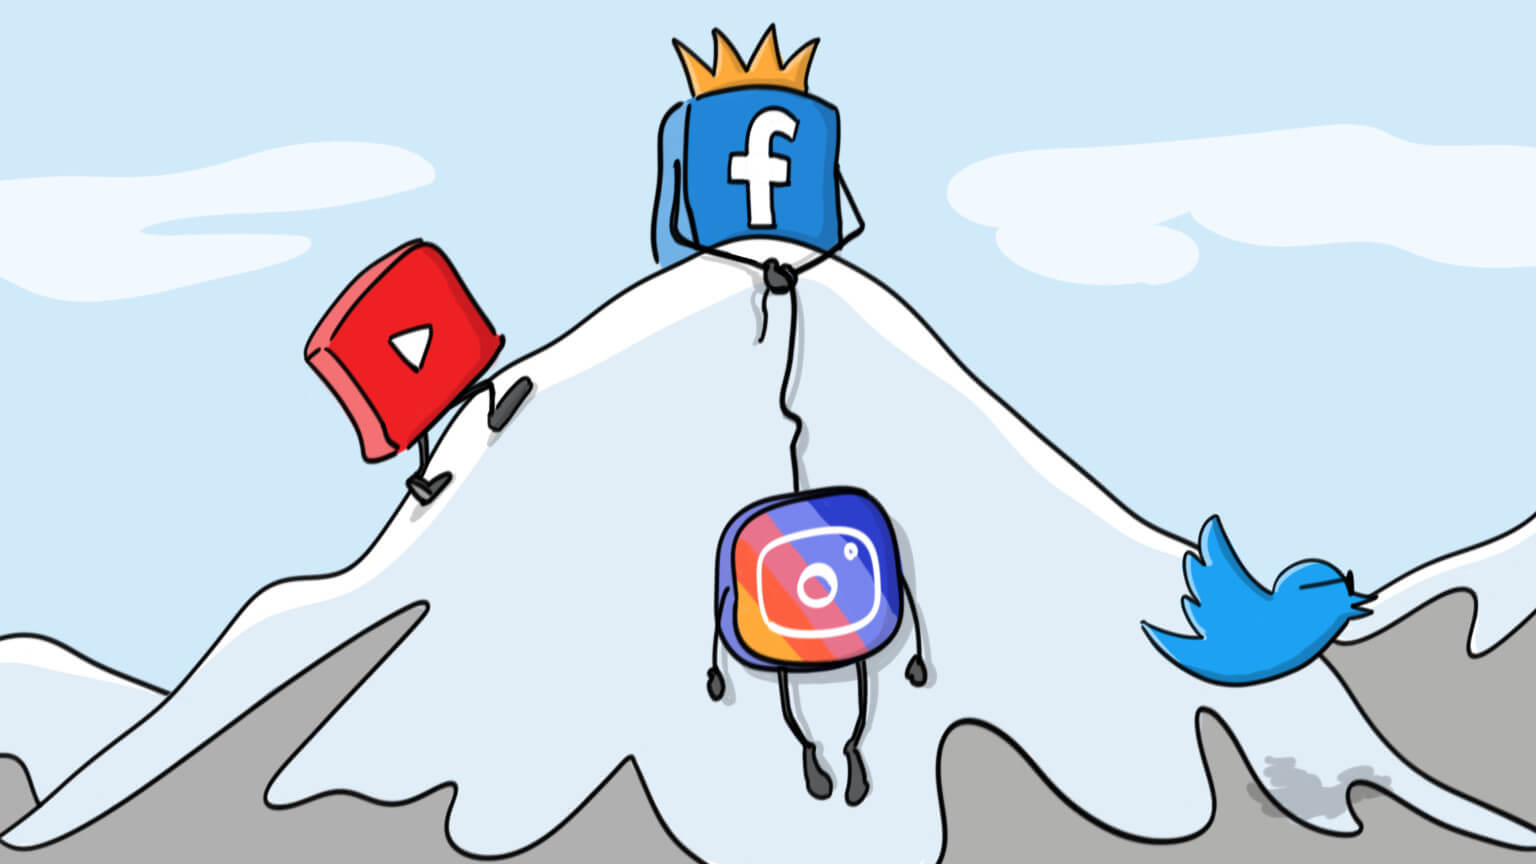 tiny-facebook-paa-toppen-thumb.jpg